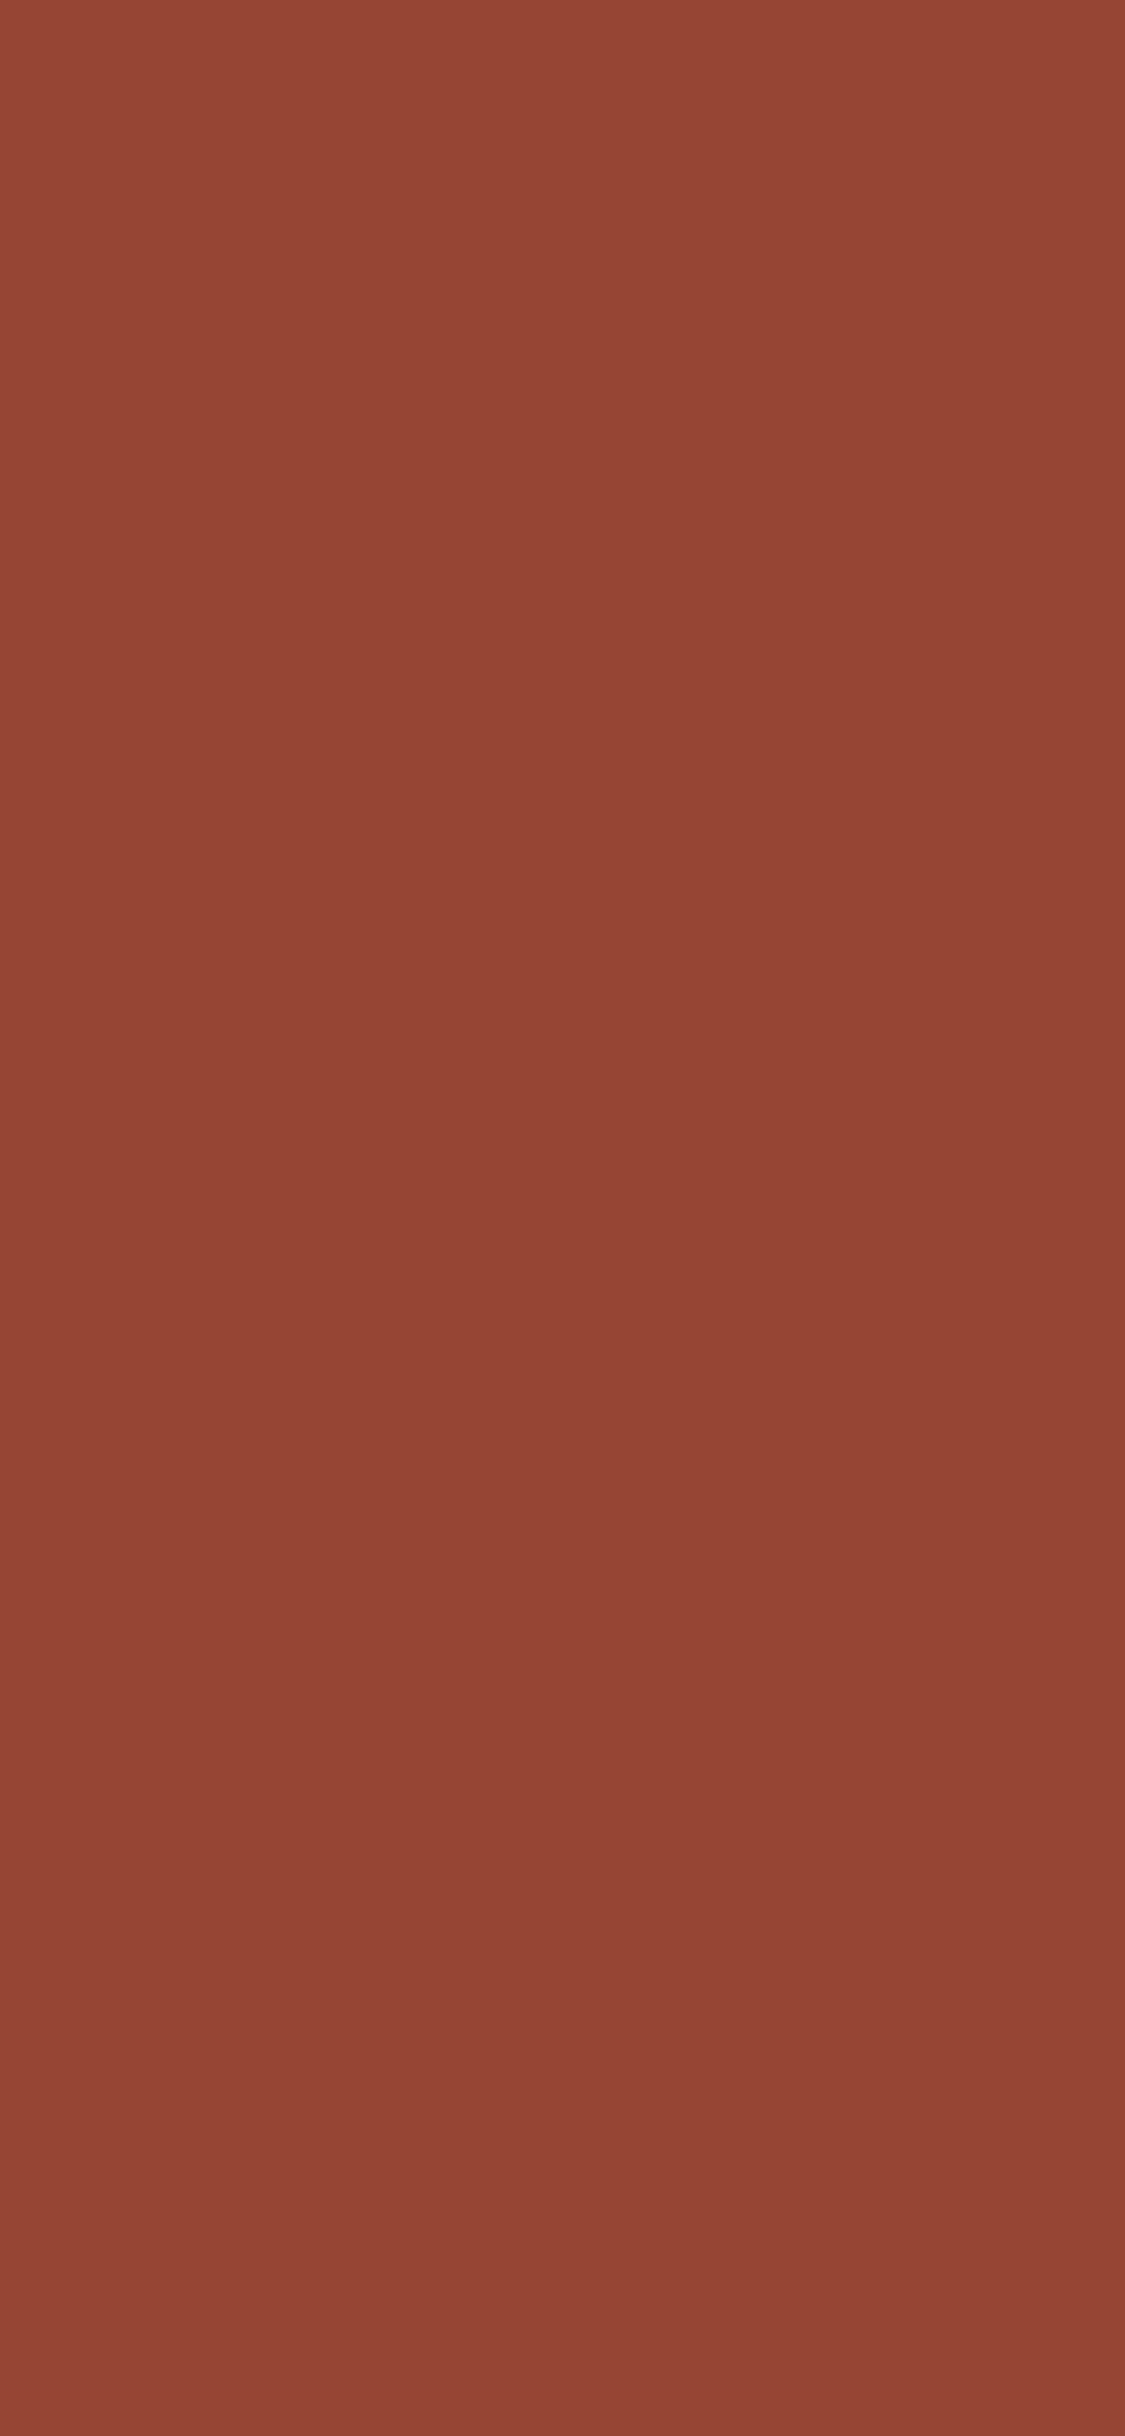 1125x2436 Chestnut Solid Color Background